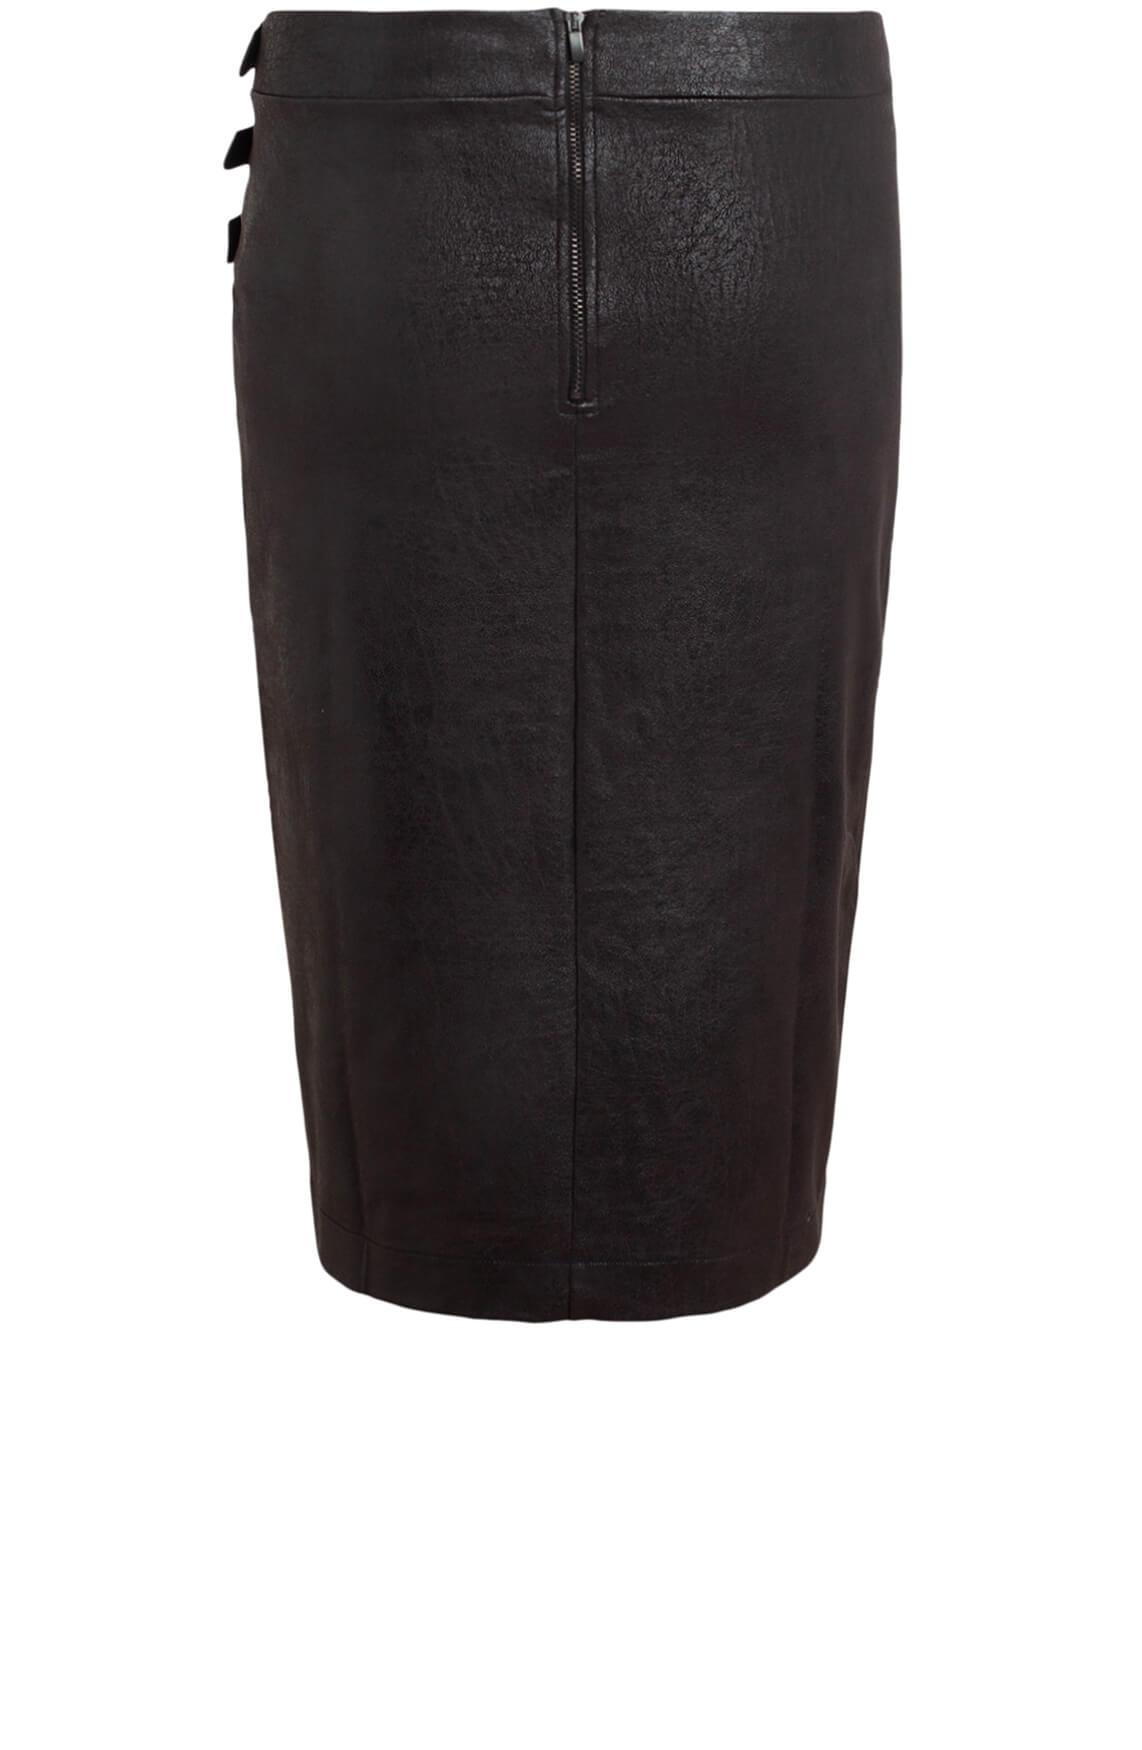 Anna Dames Rok met gespjes zwart